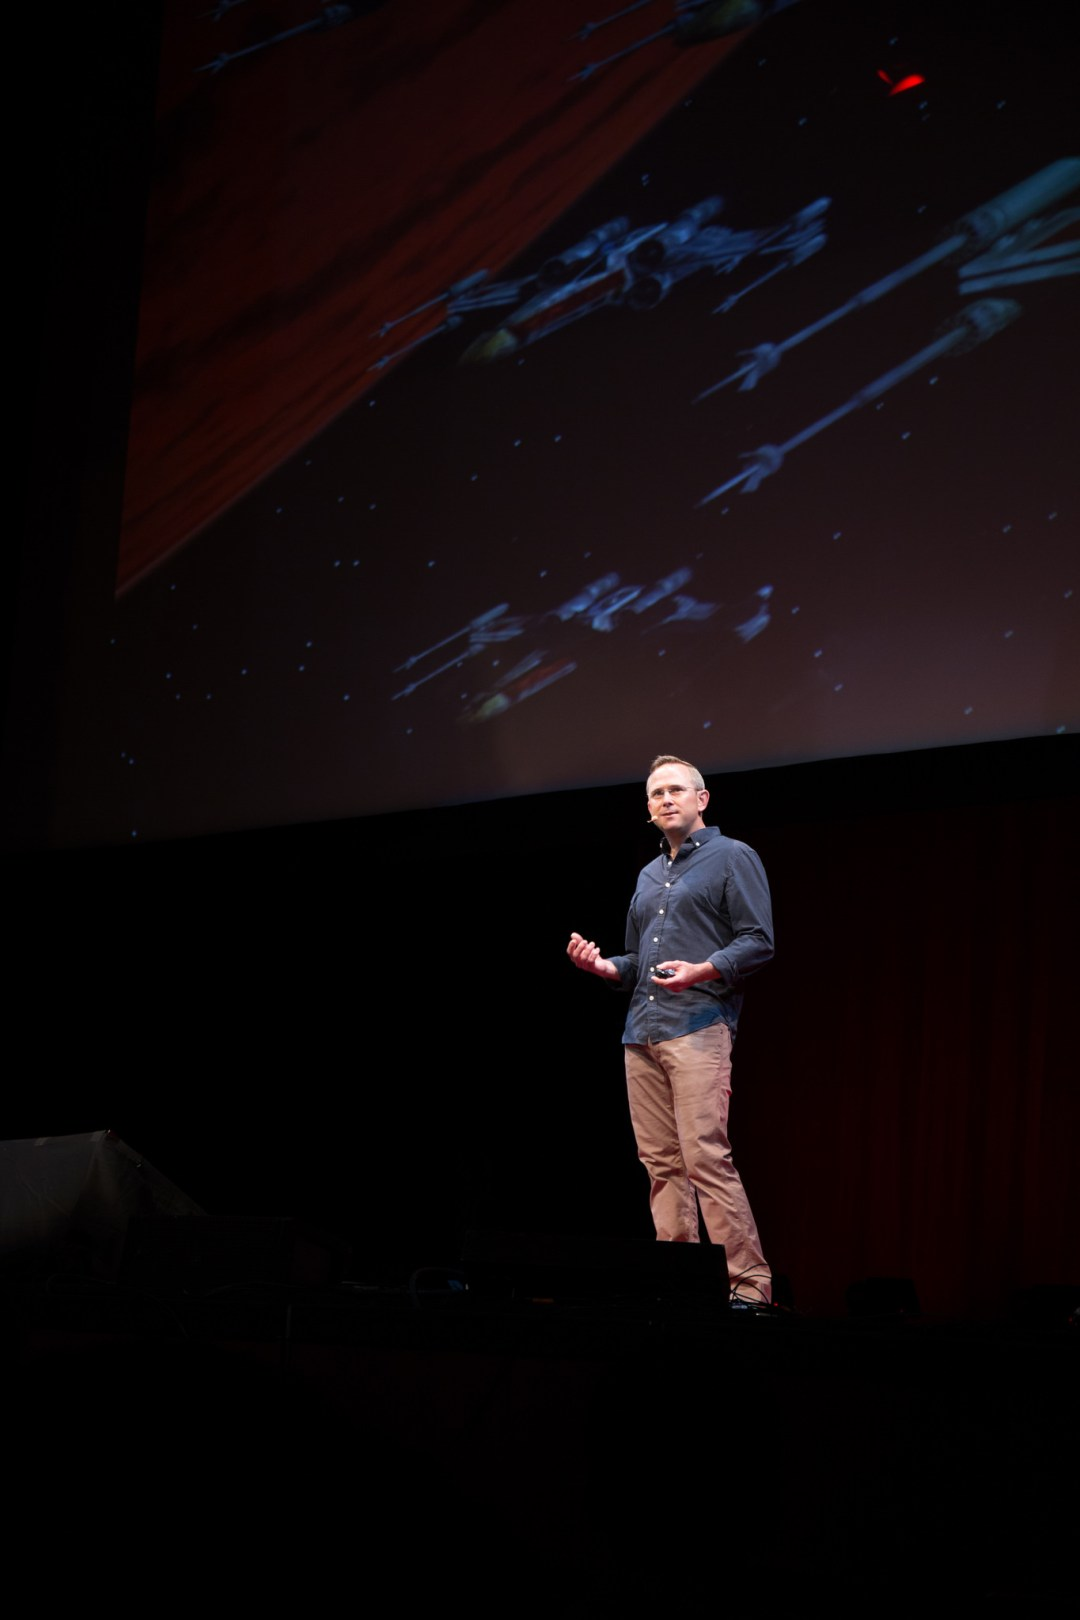 Space travel is human travel | Dana Carpenter